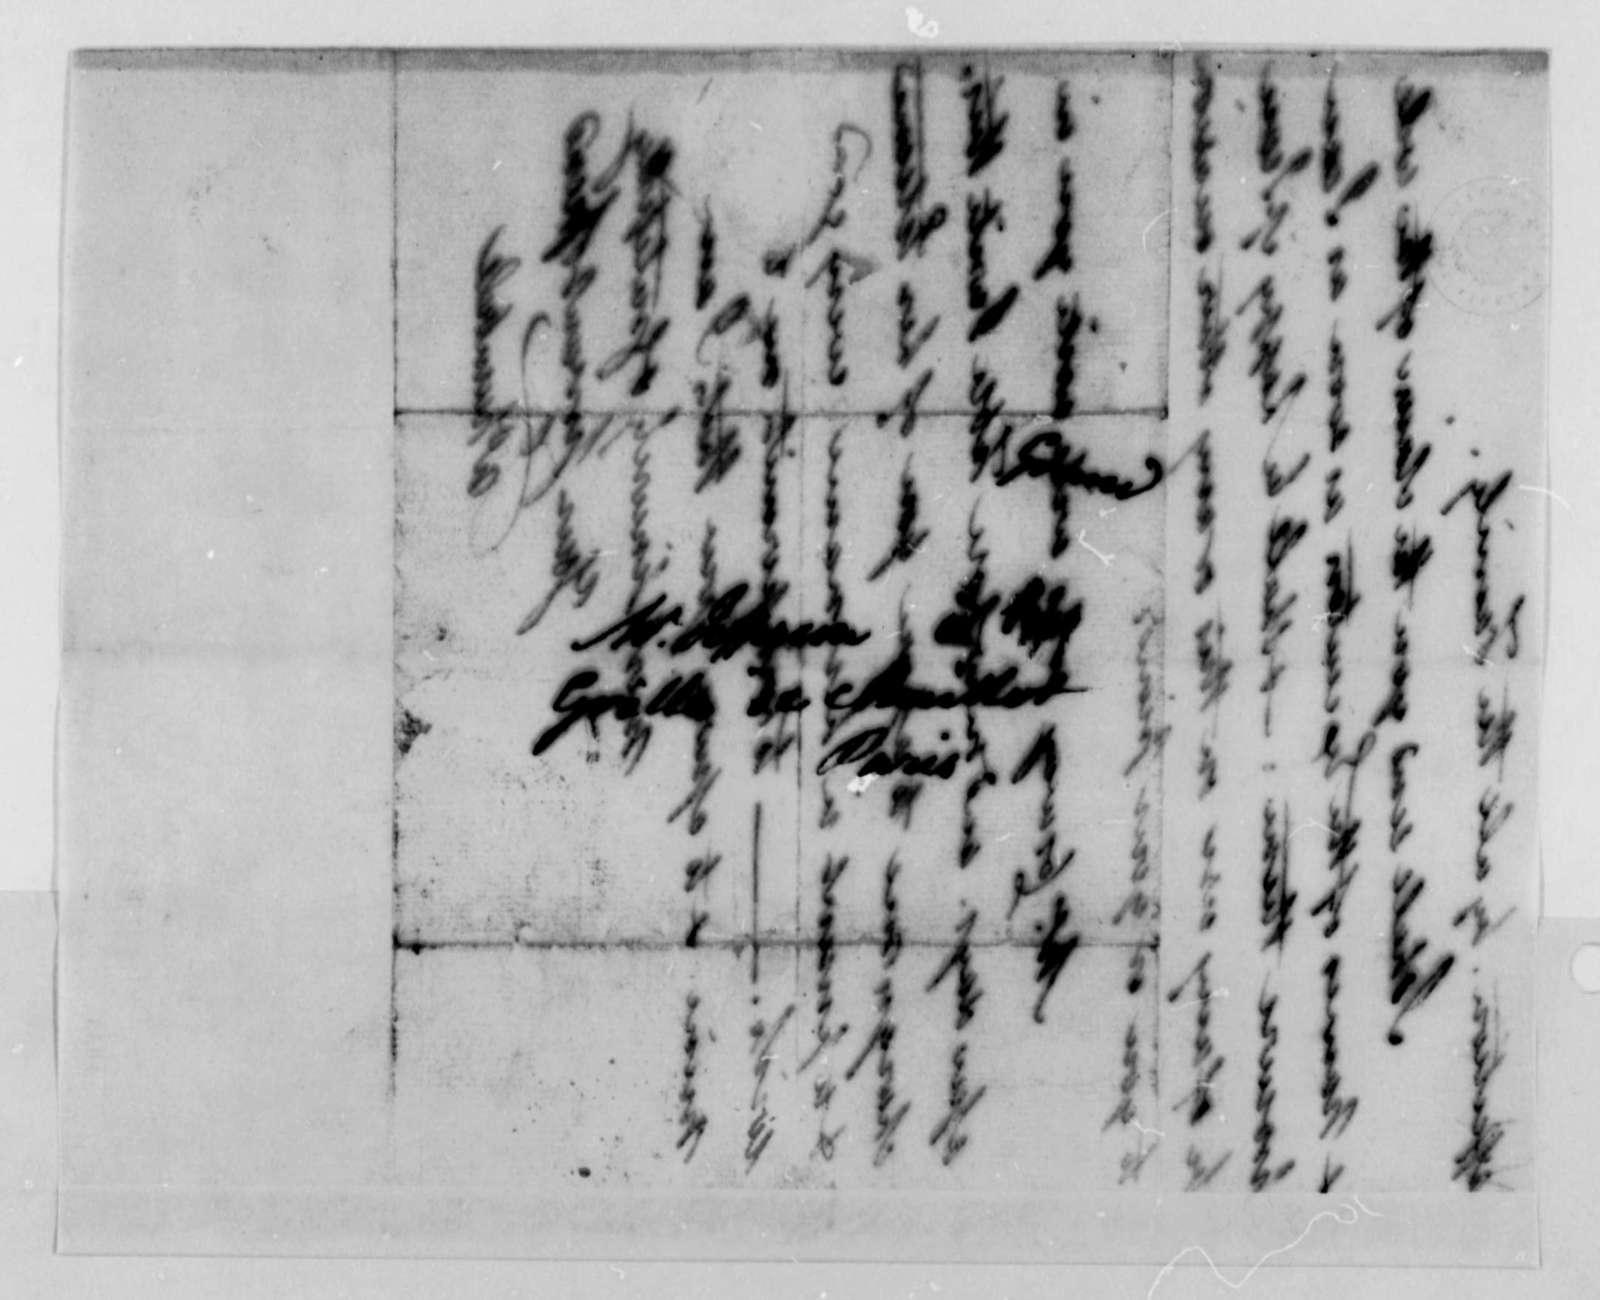 John Trumbull to Thomas Jefferson, February 15, 1787